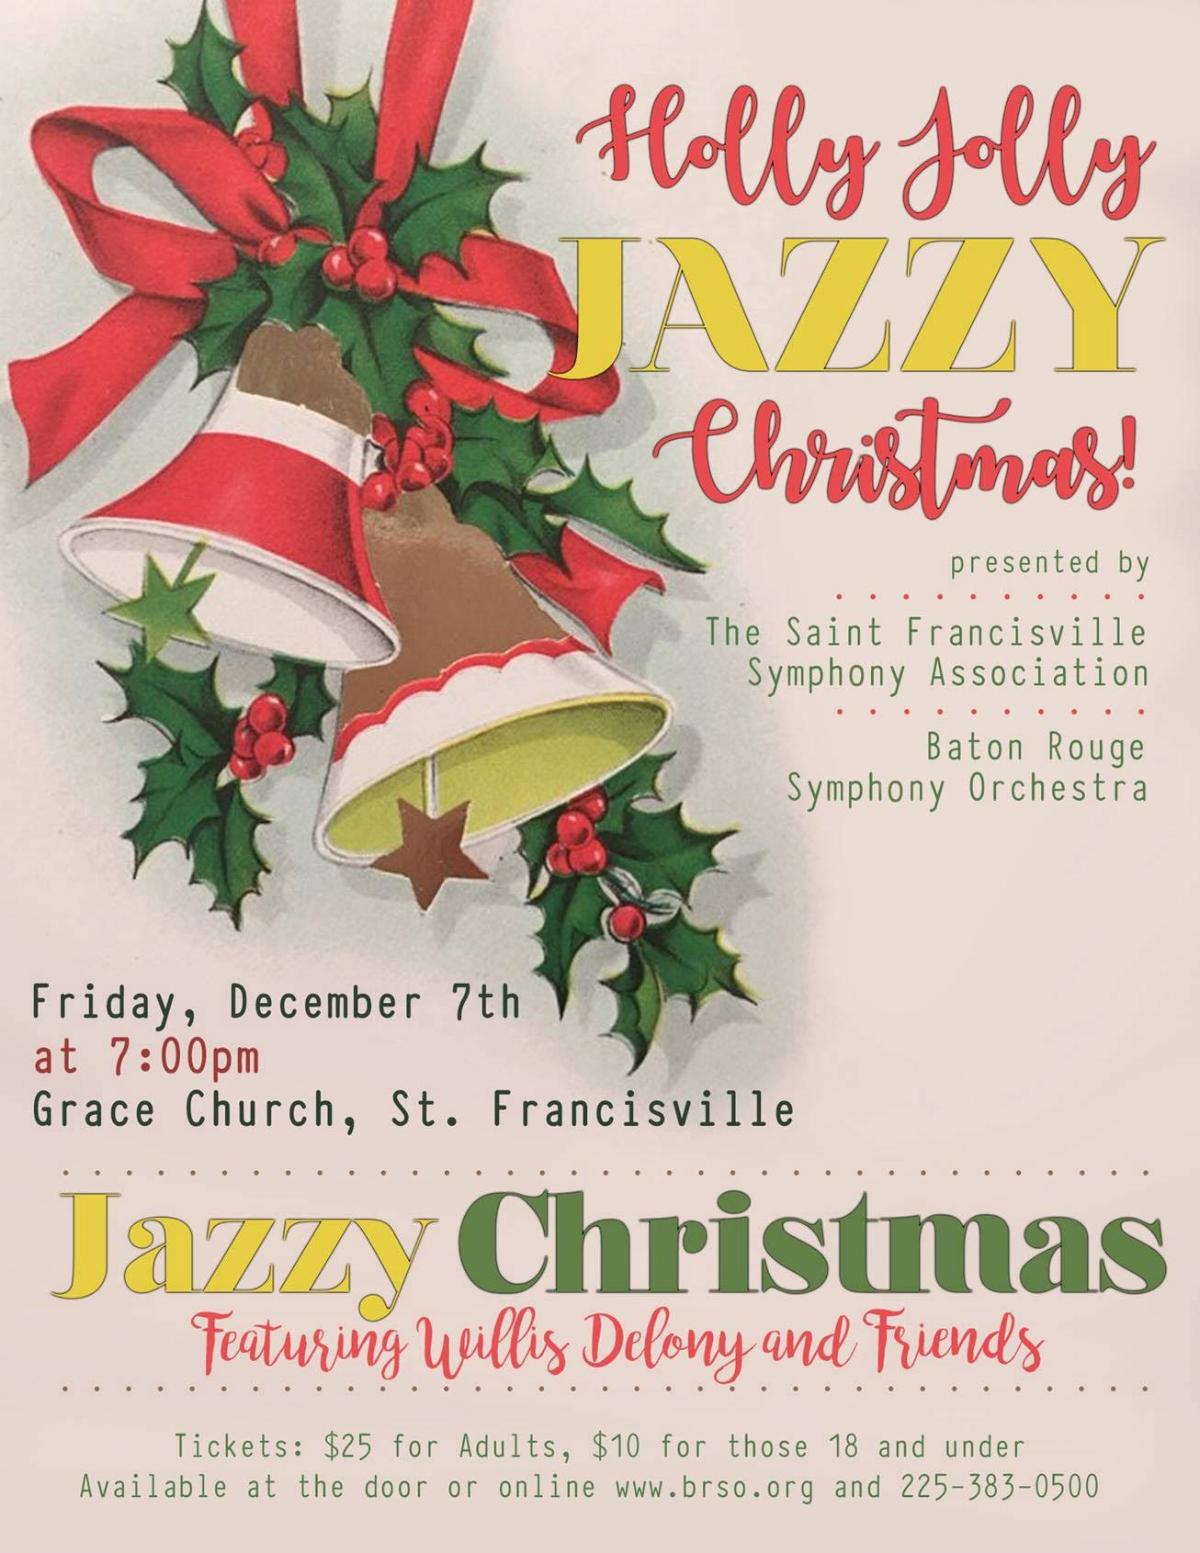 jazz-christmas-poster.jpg